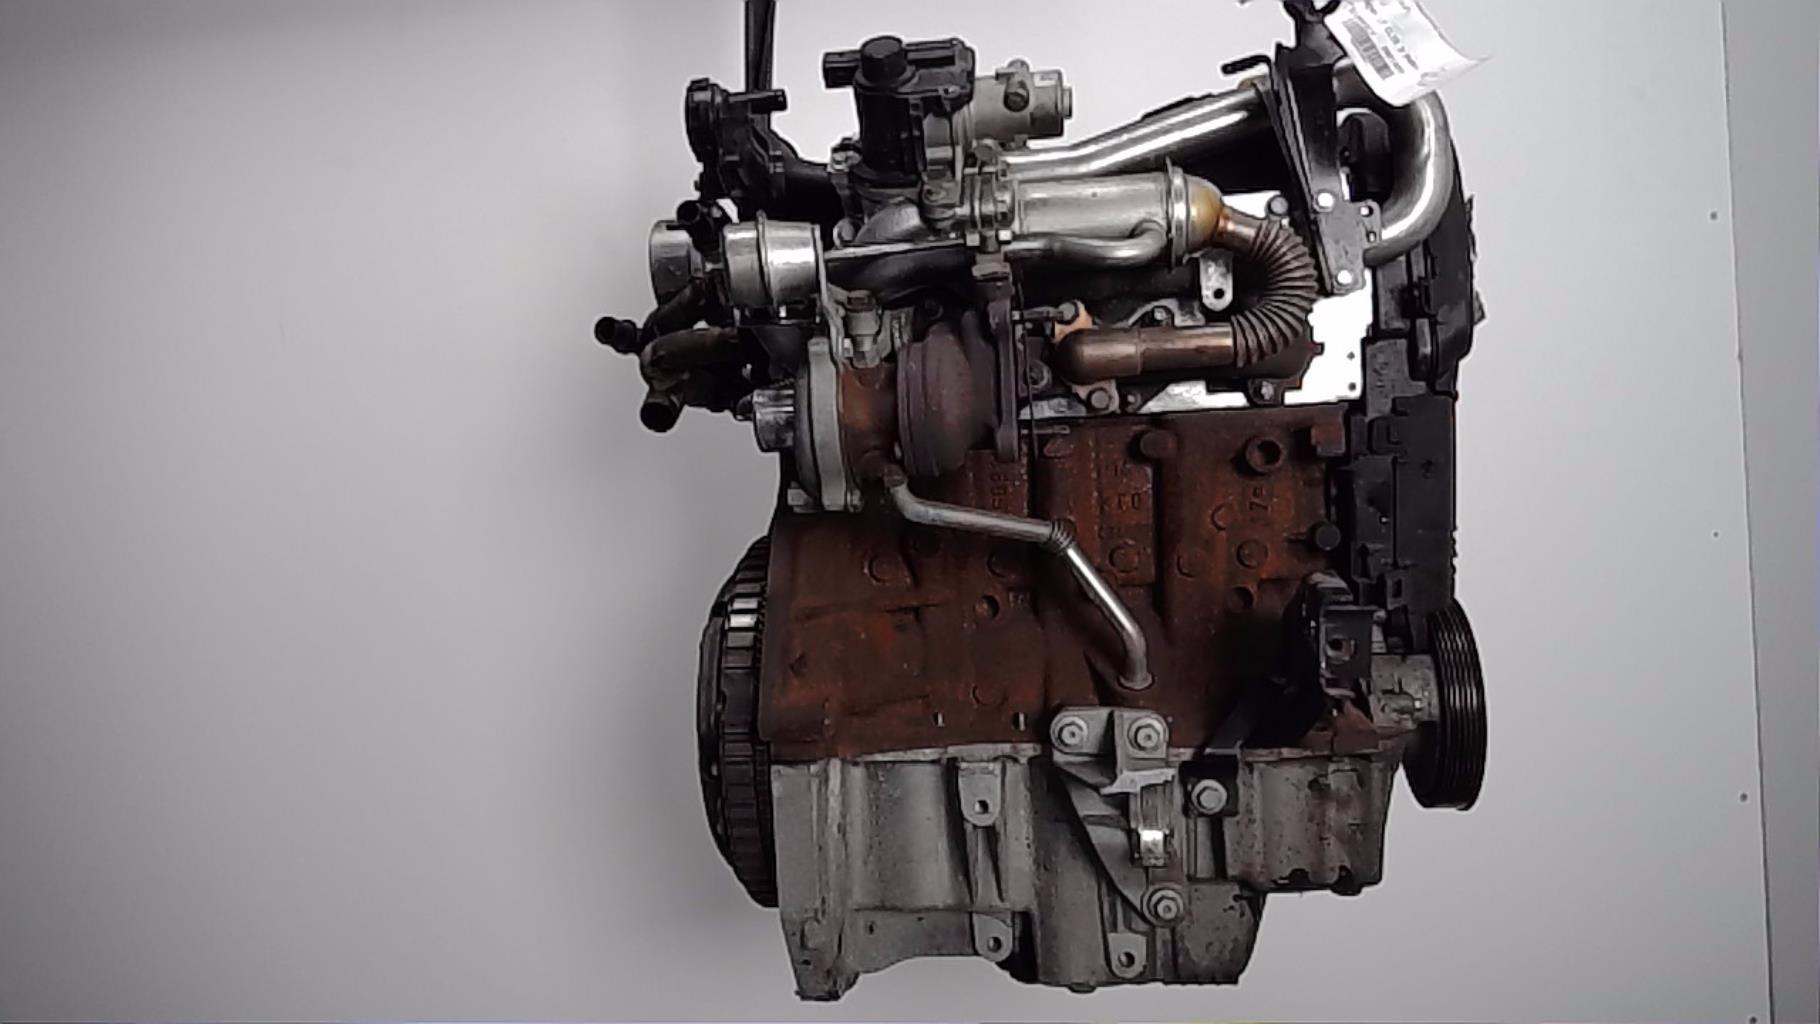 Moteur RENAULT CLIO 3 PHASE 2 Diesel